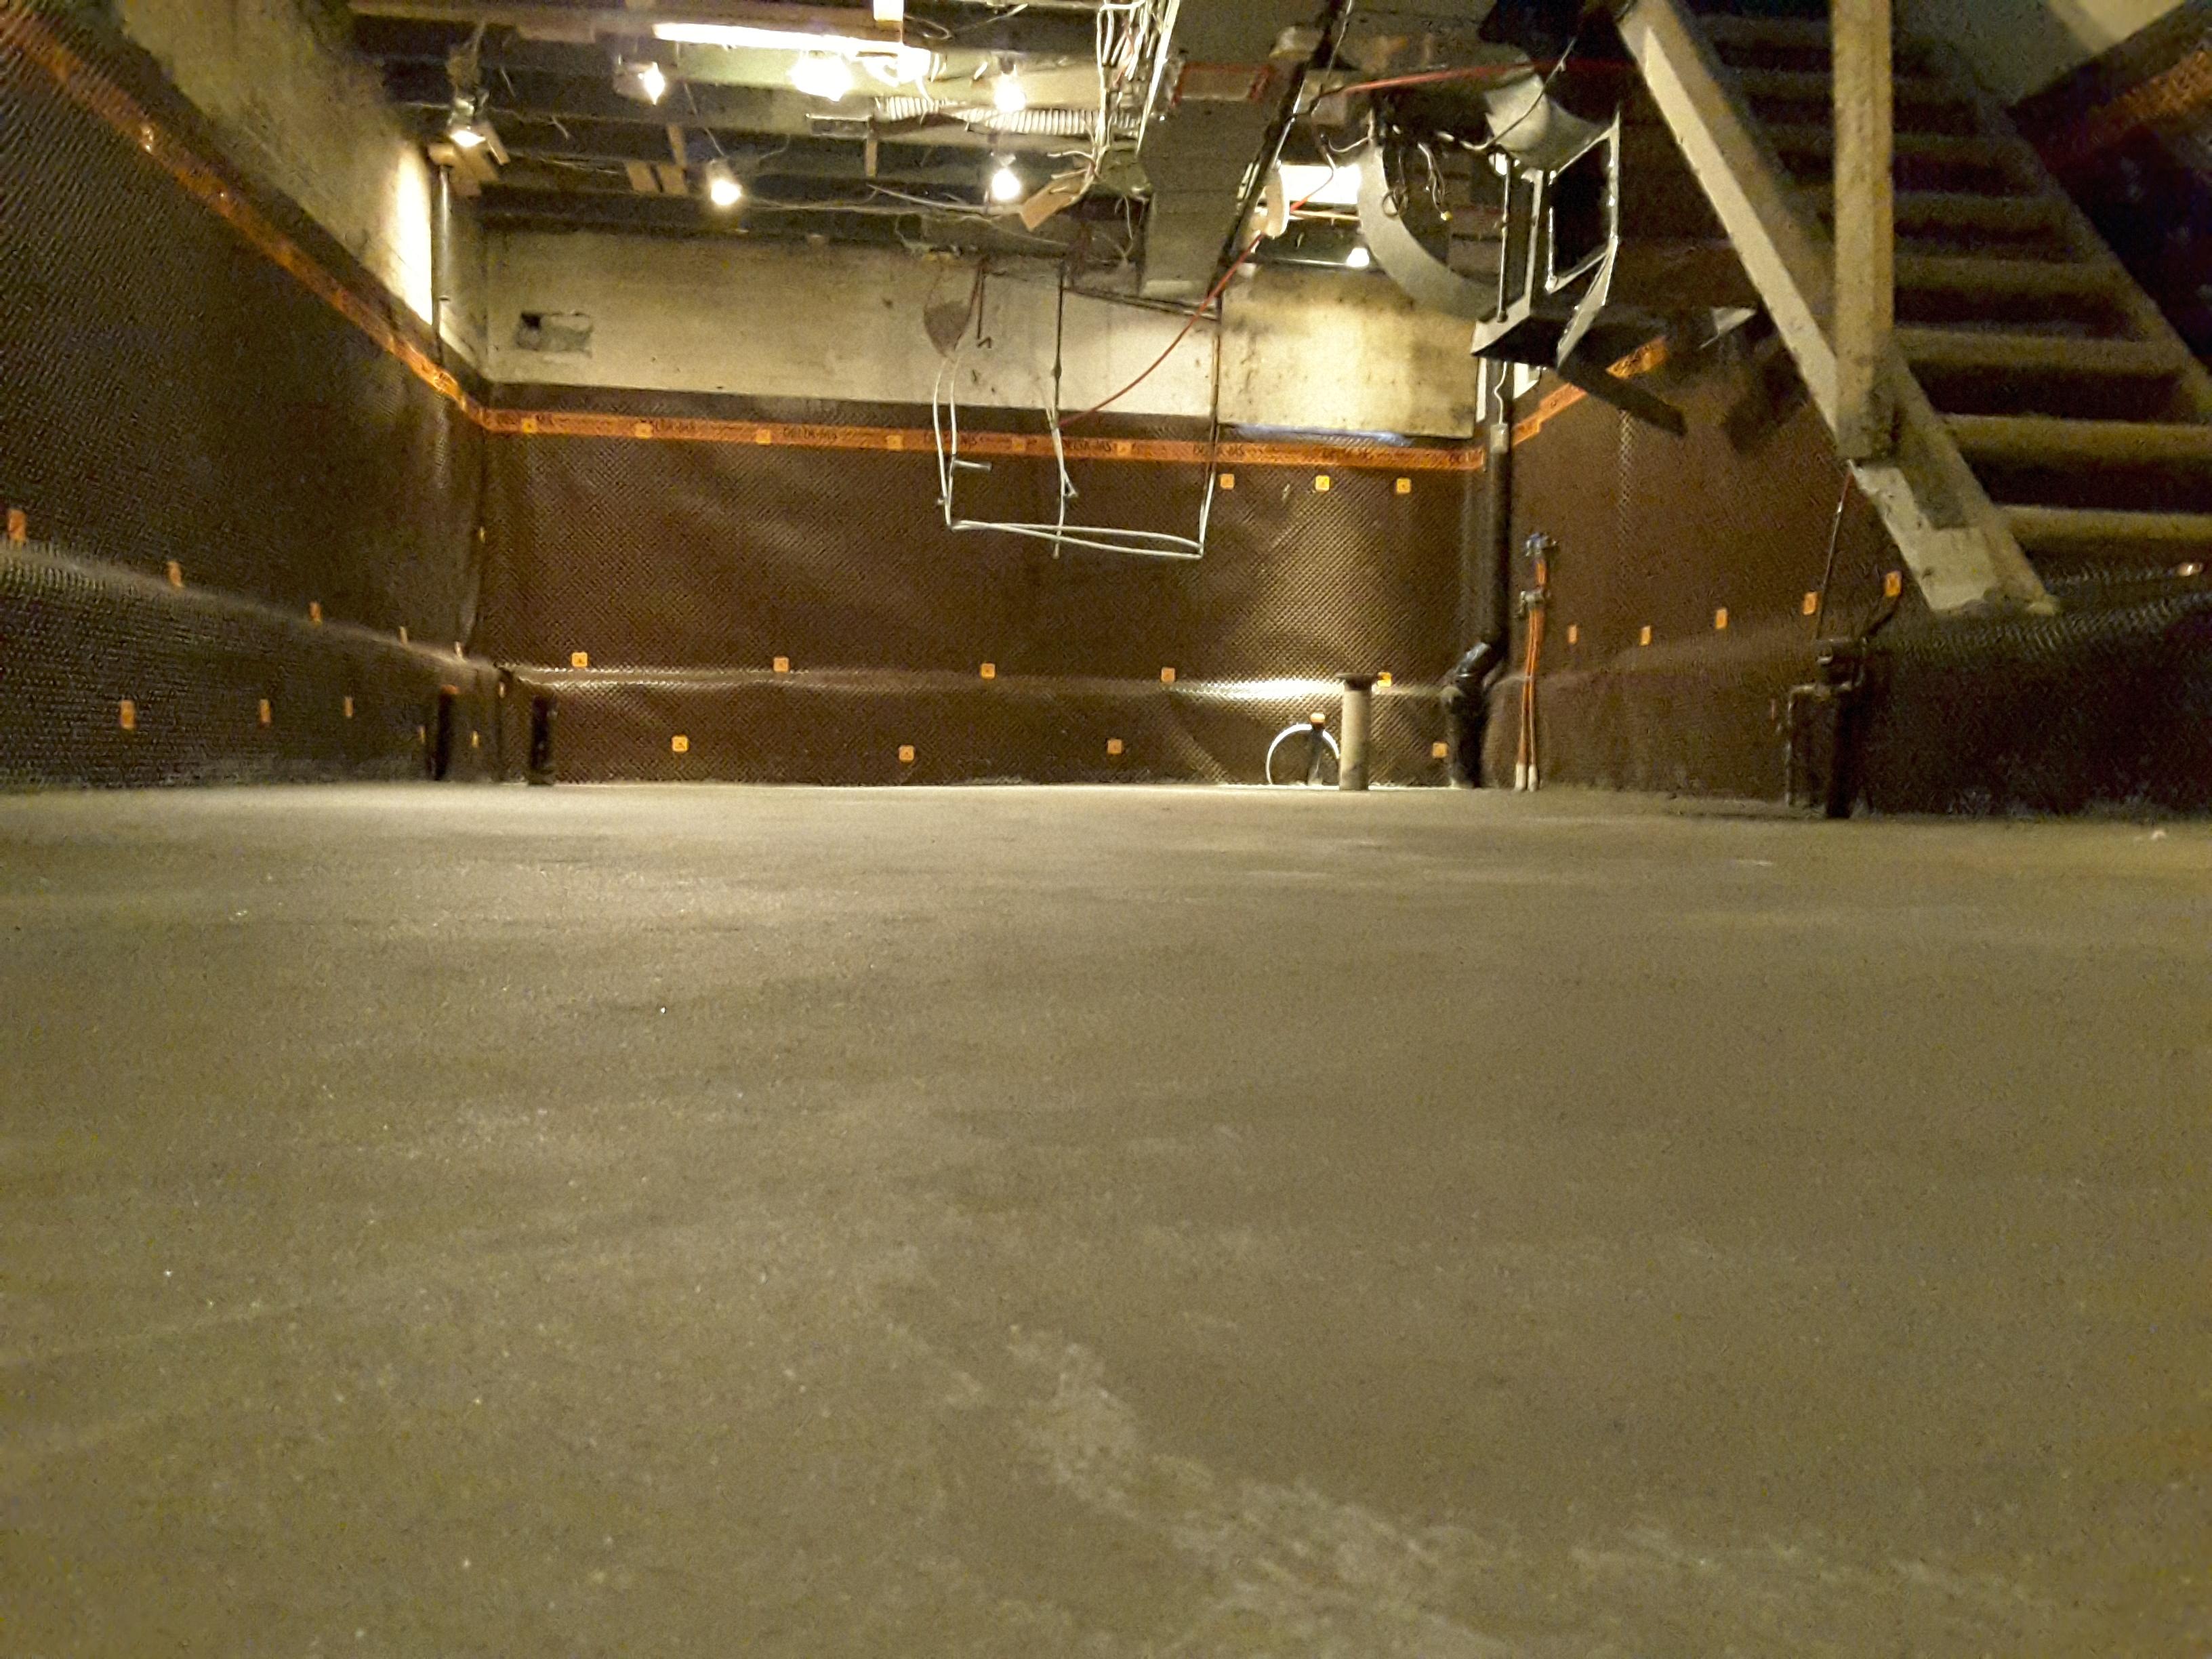 Basament Lowering - Ground Level